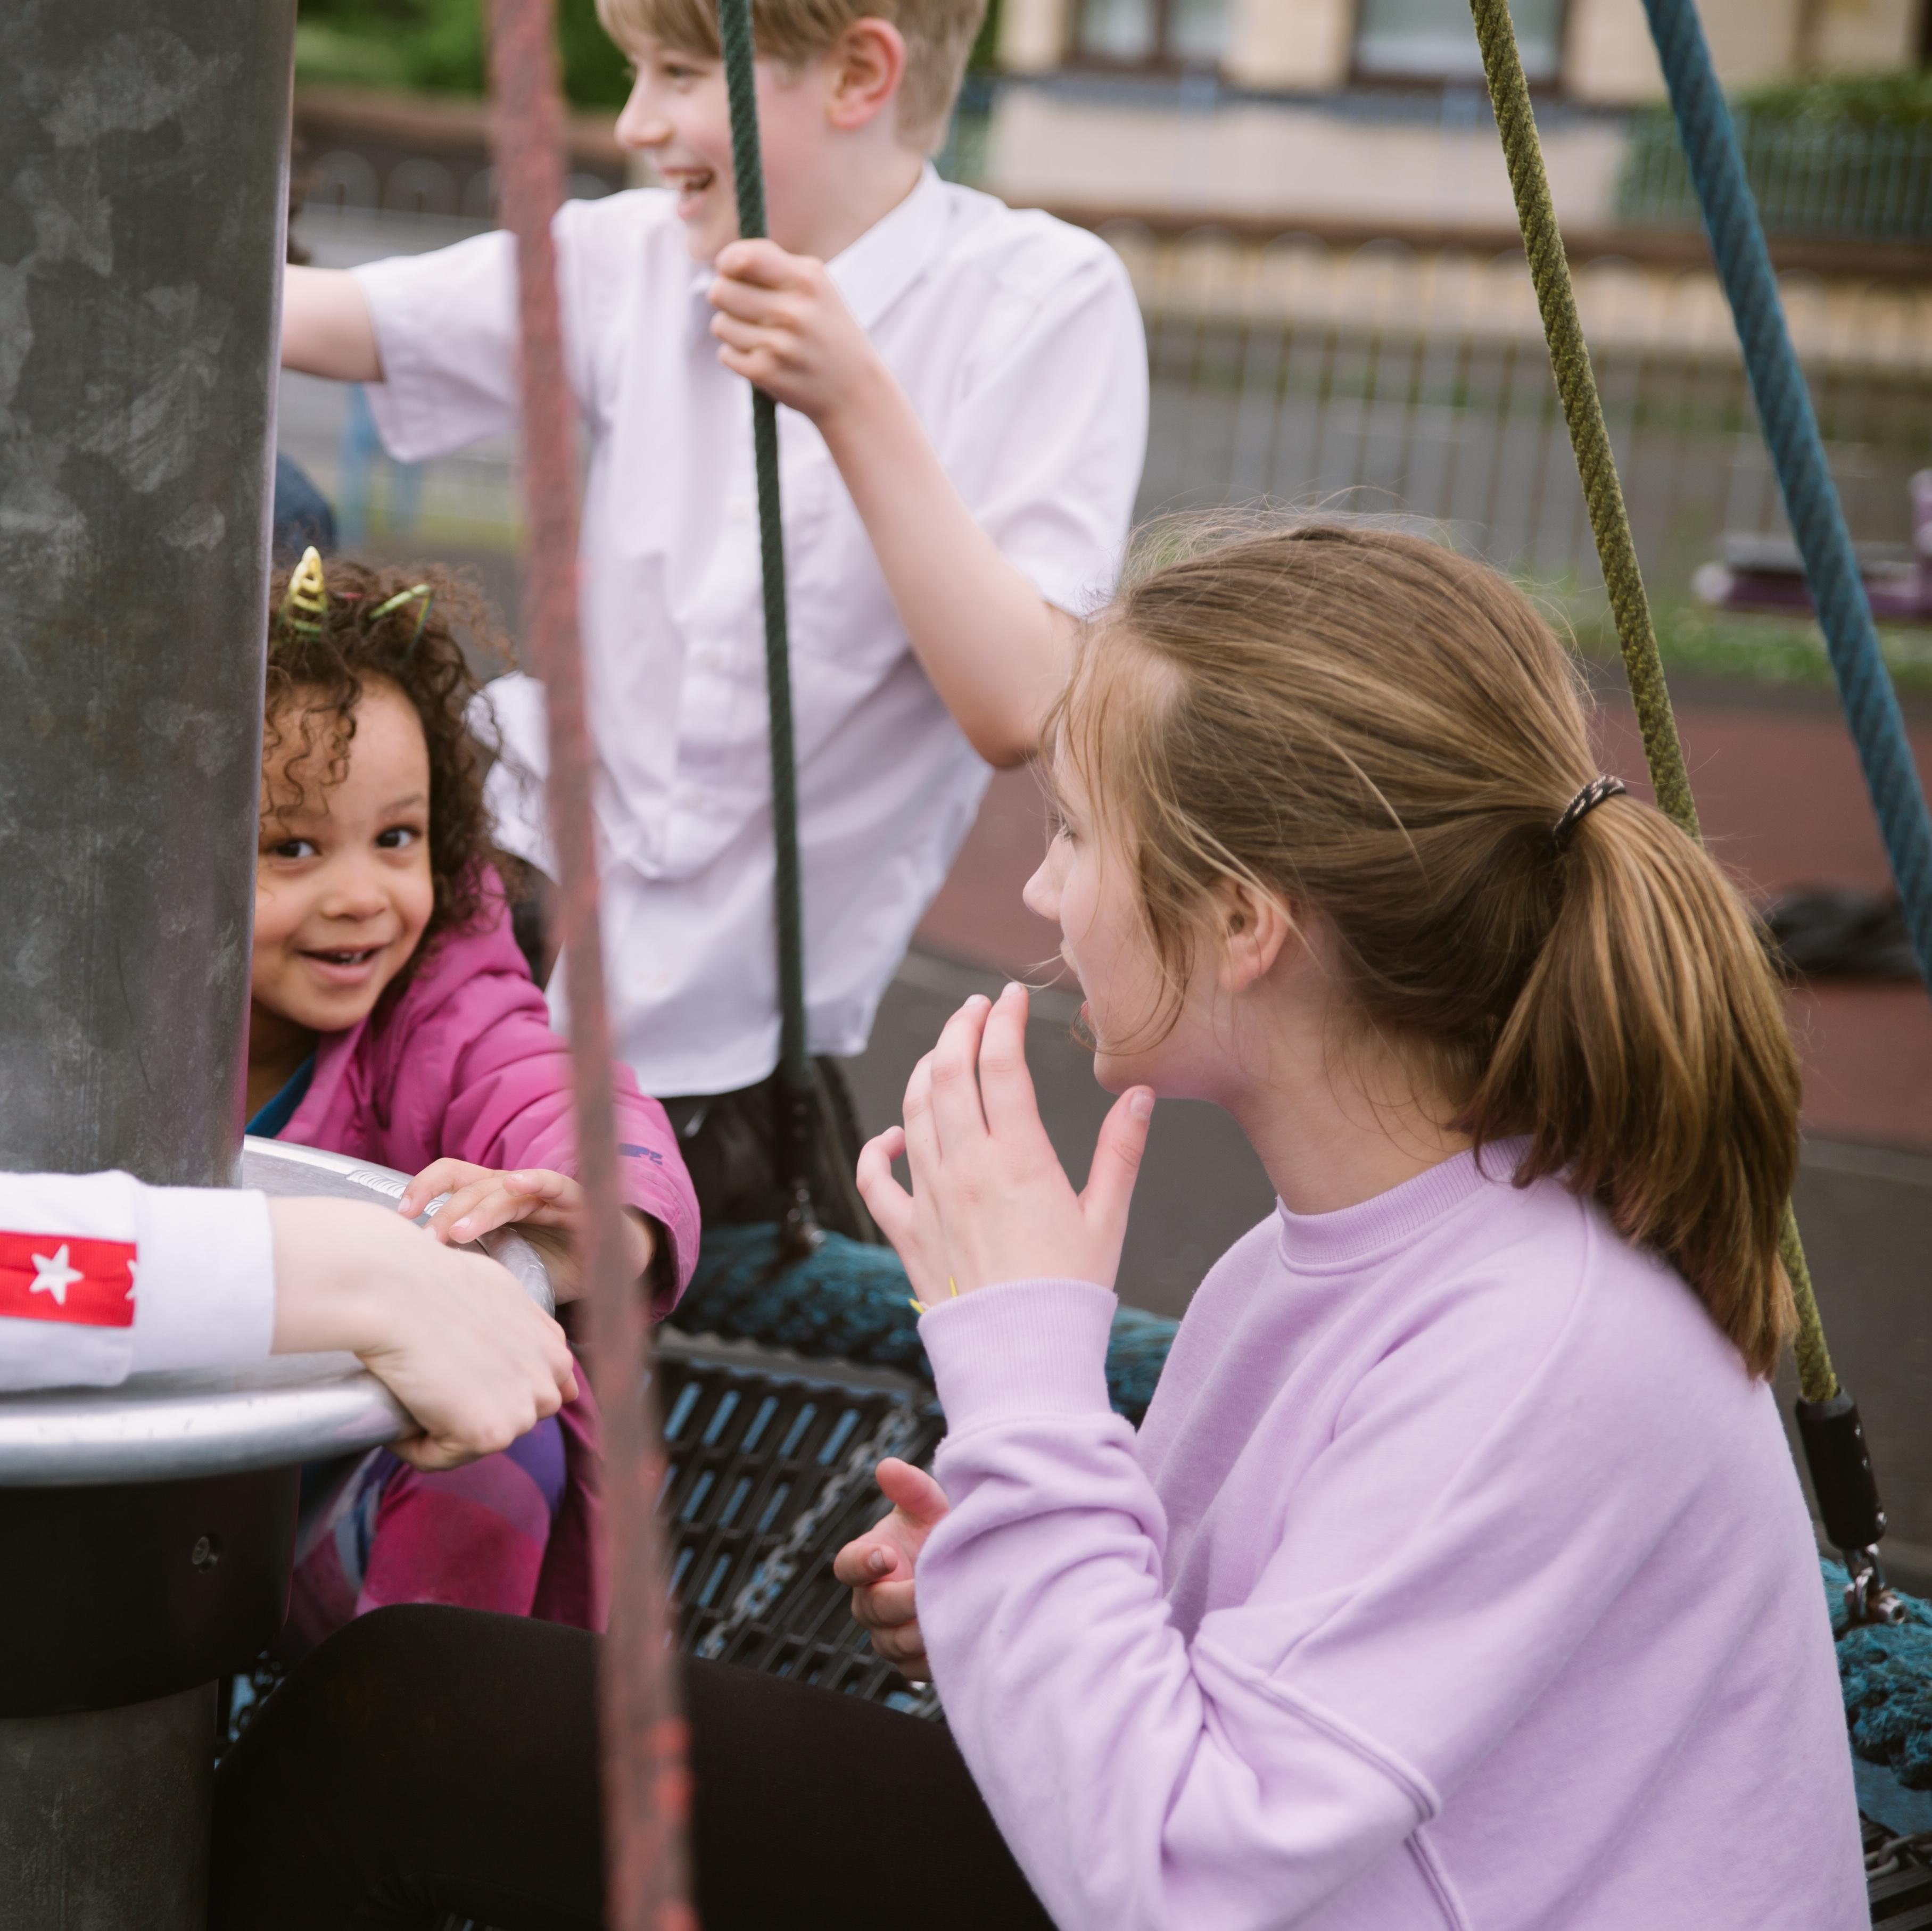 children-on-swing